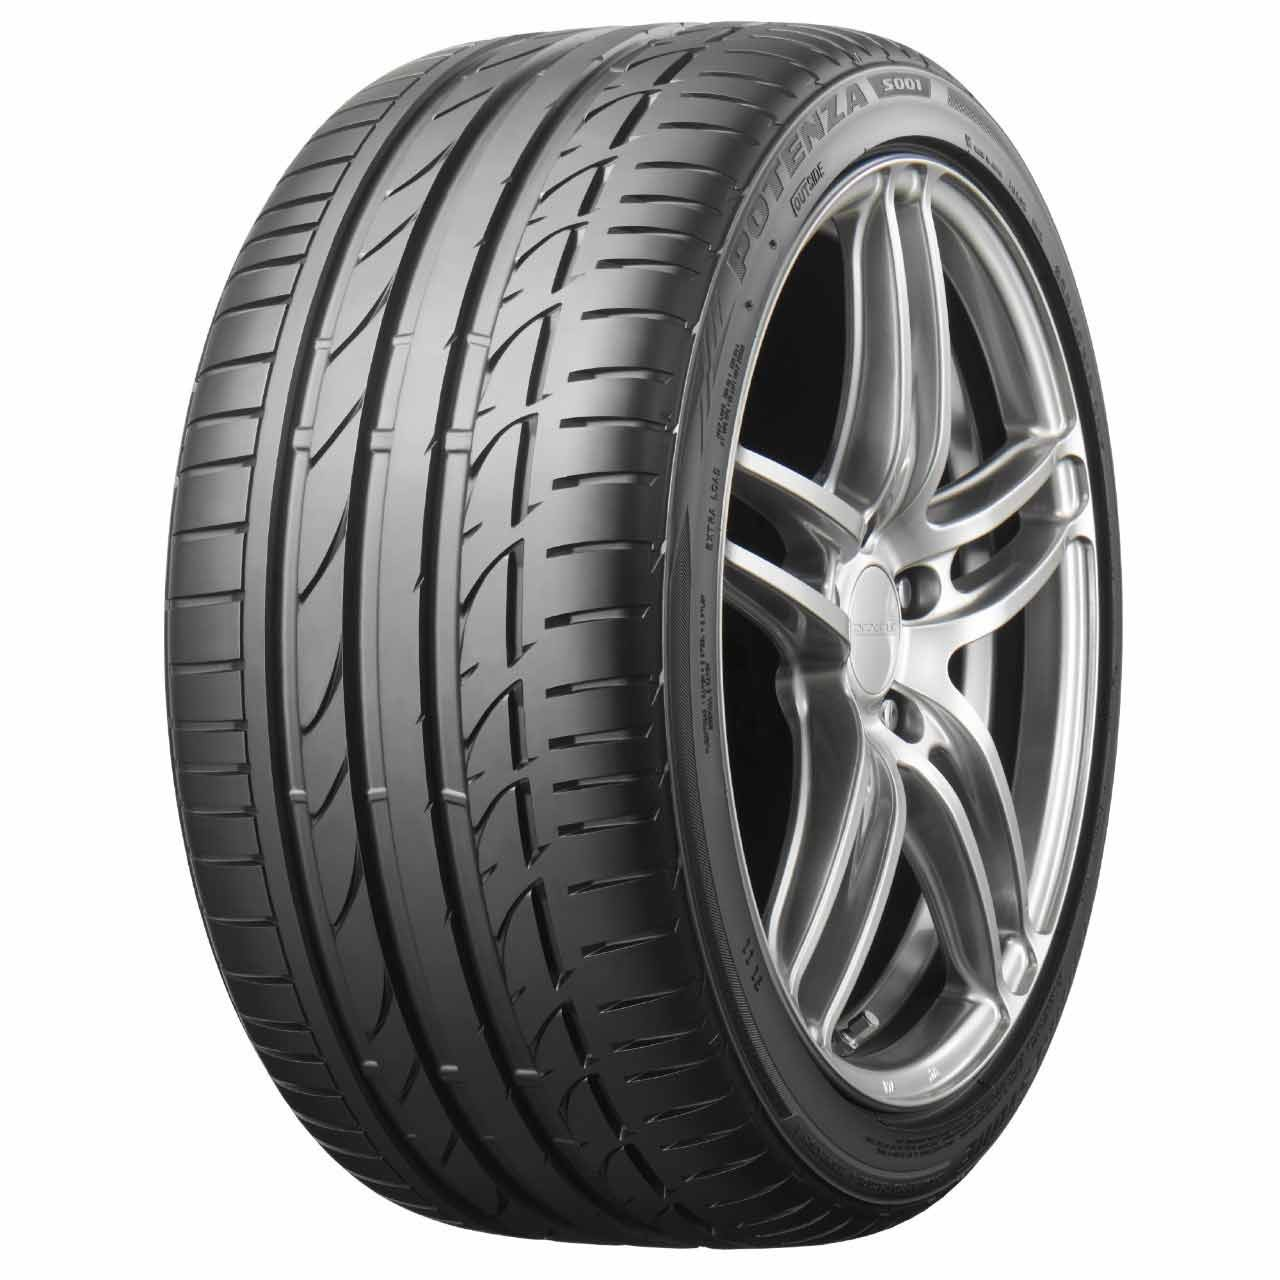 Шины Bridgestone Potenza RE 5 (Бриджстоун Потенза